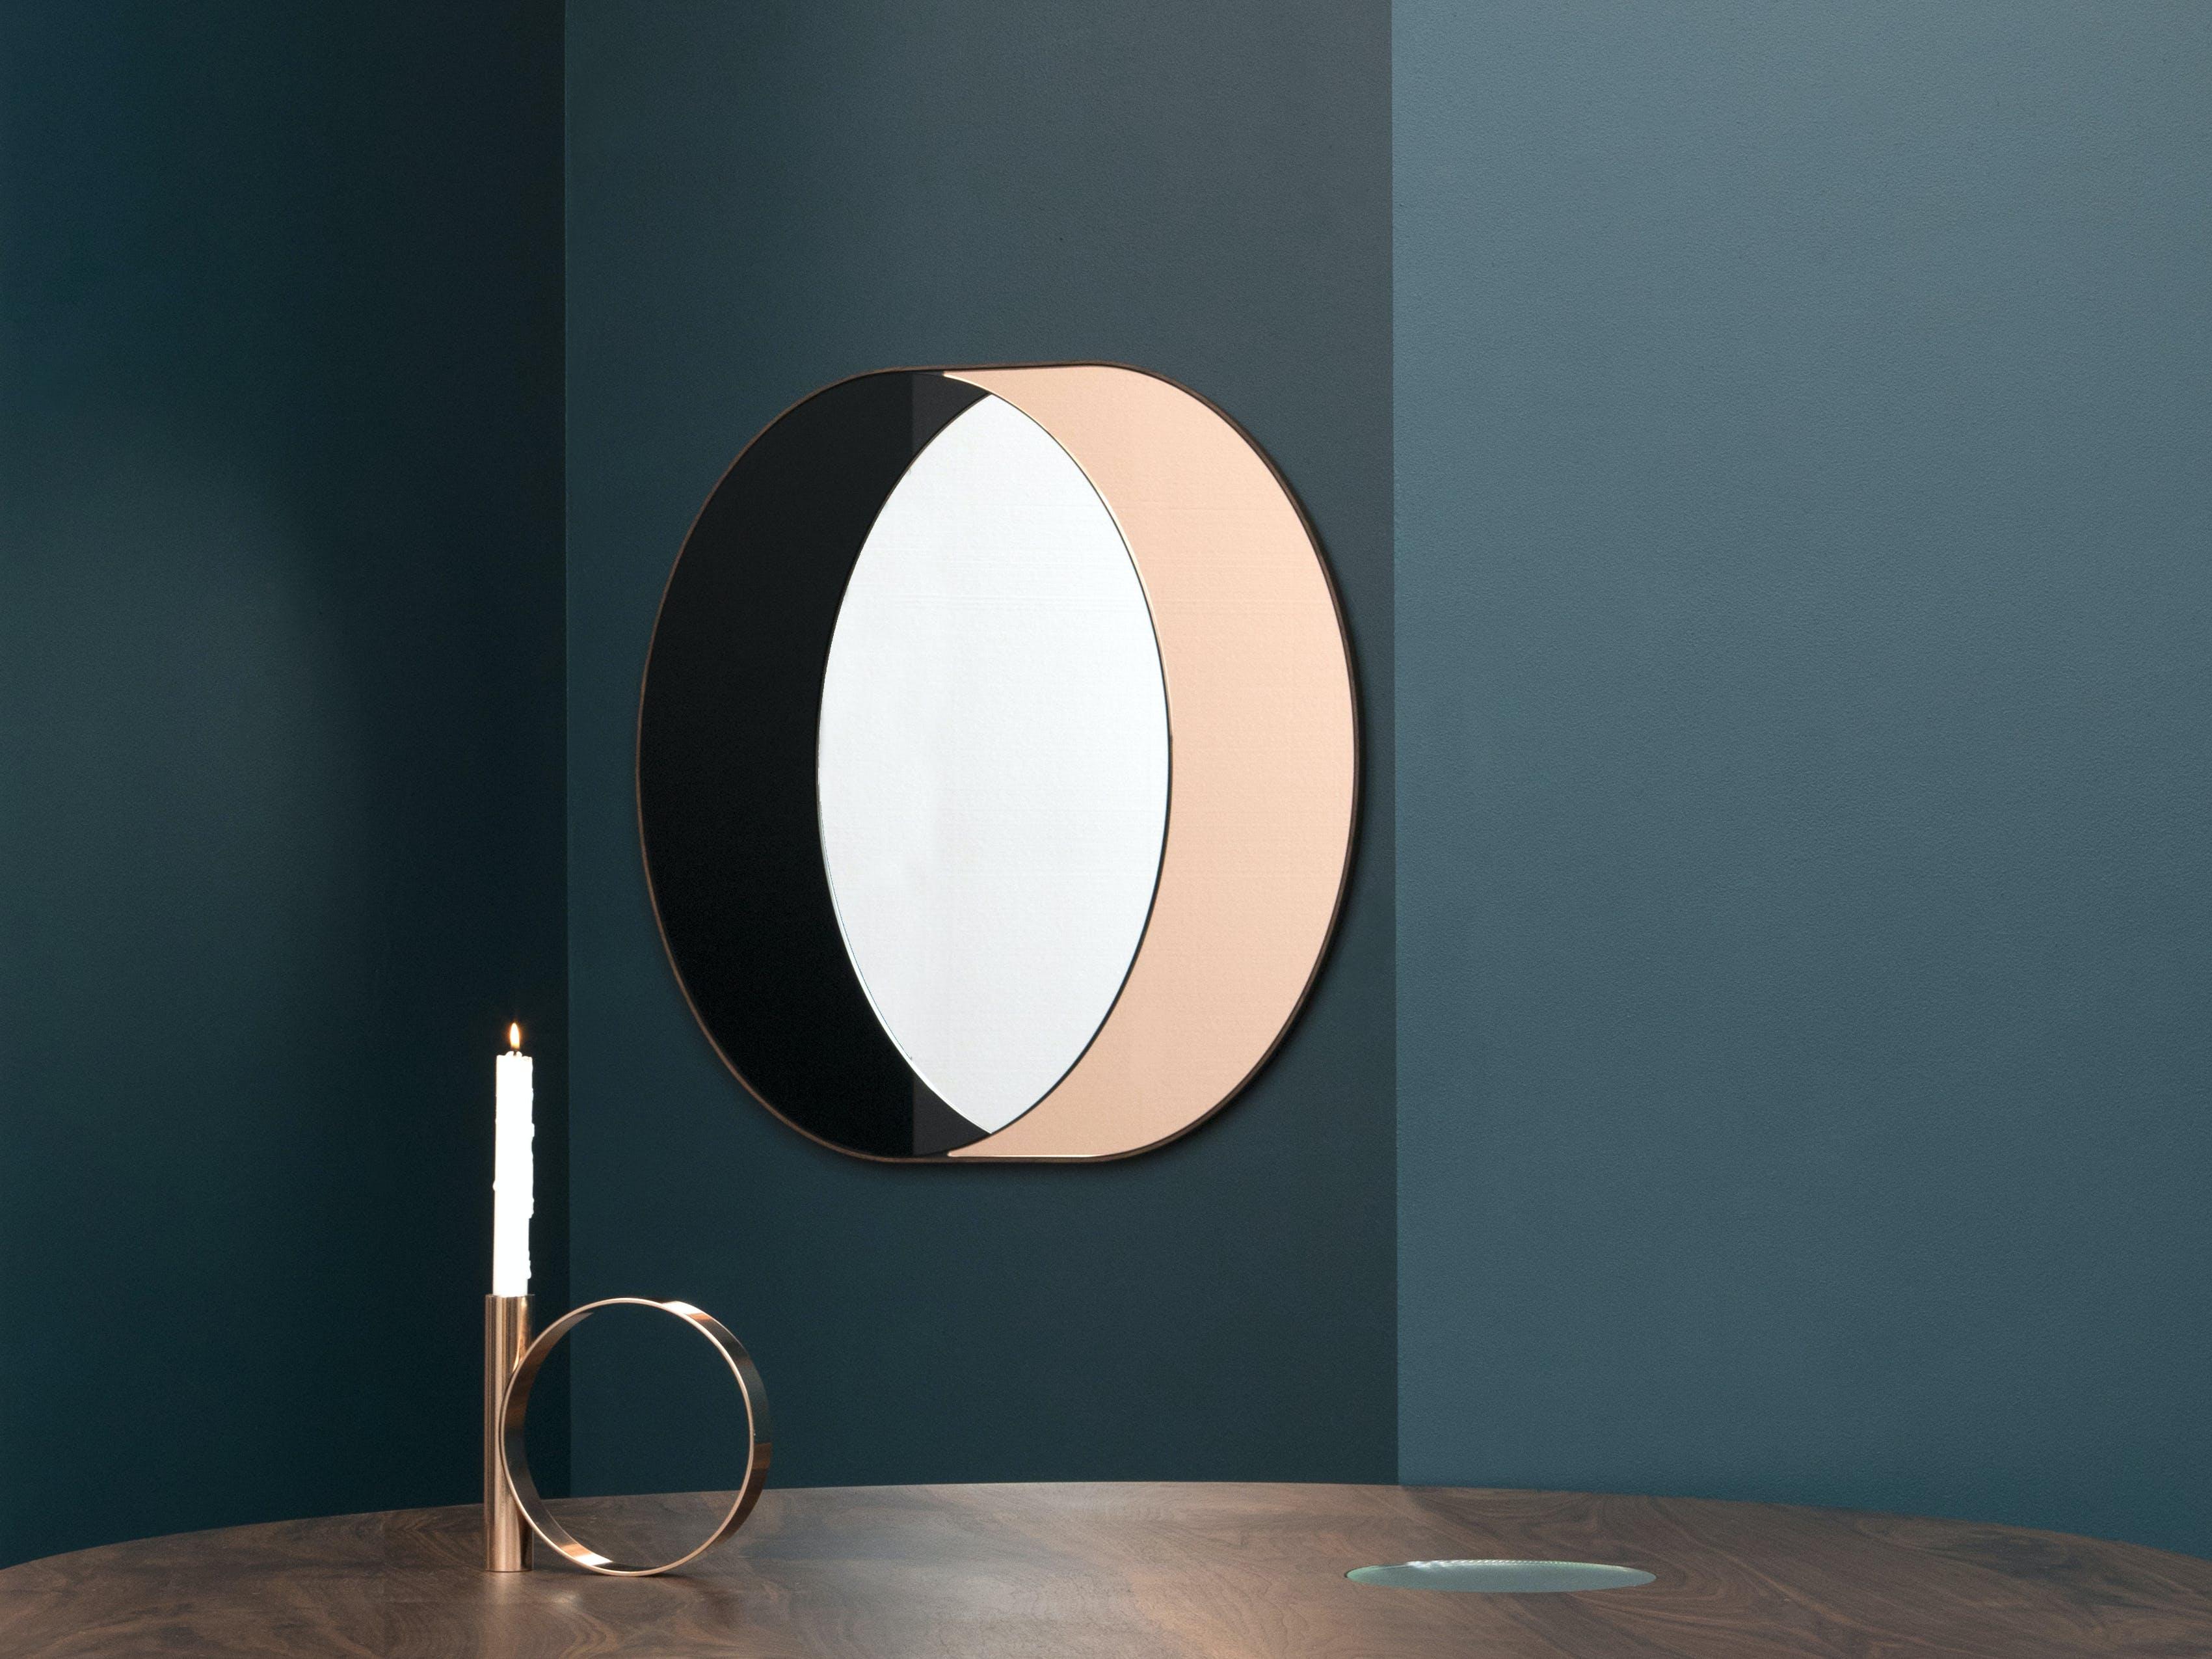 Ring Mirror Photo By Charlie Schuck 2